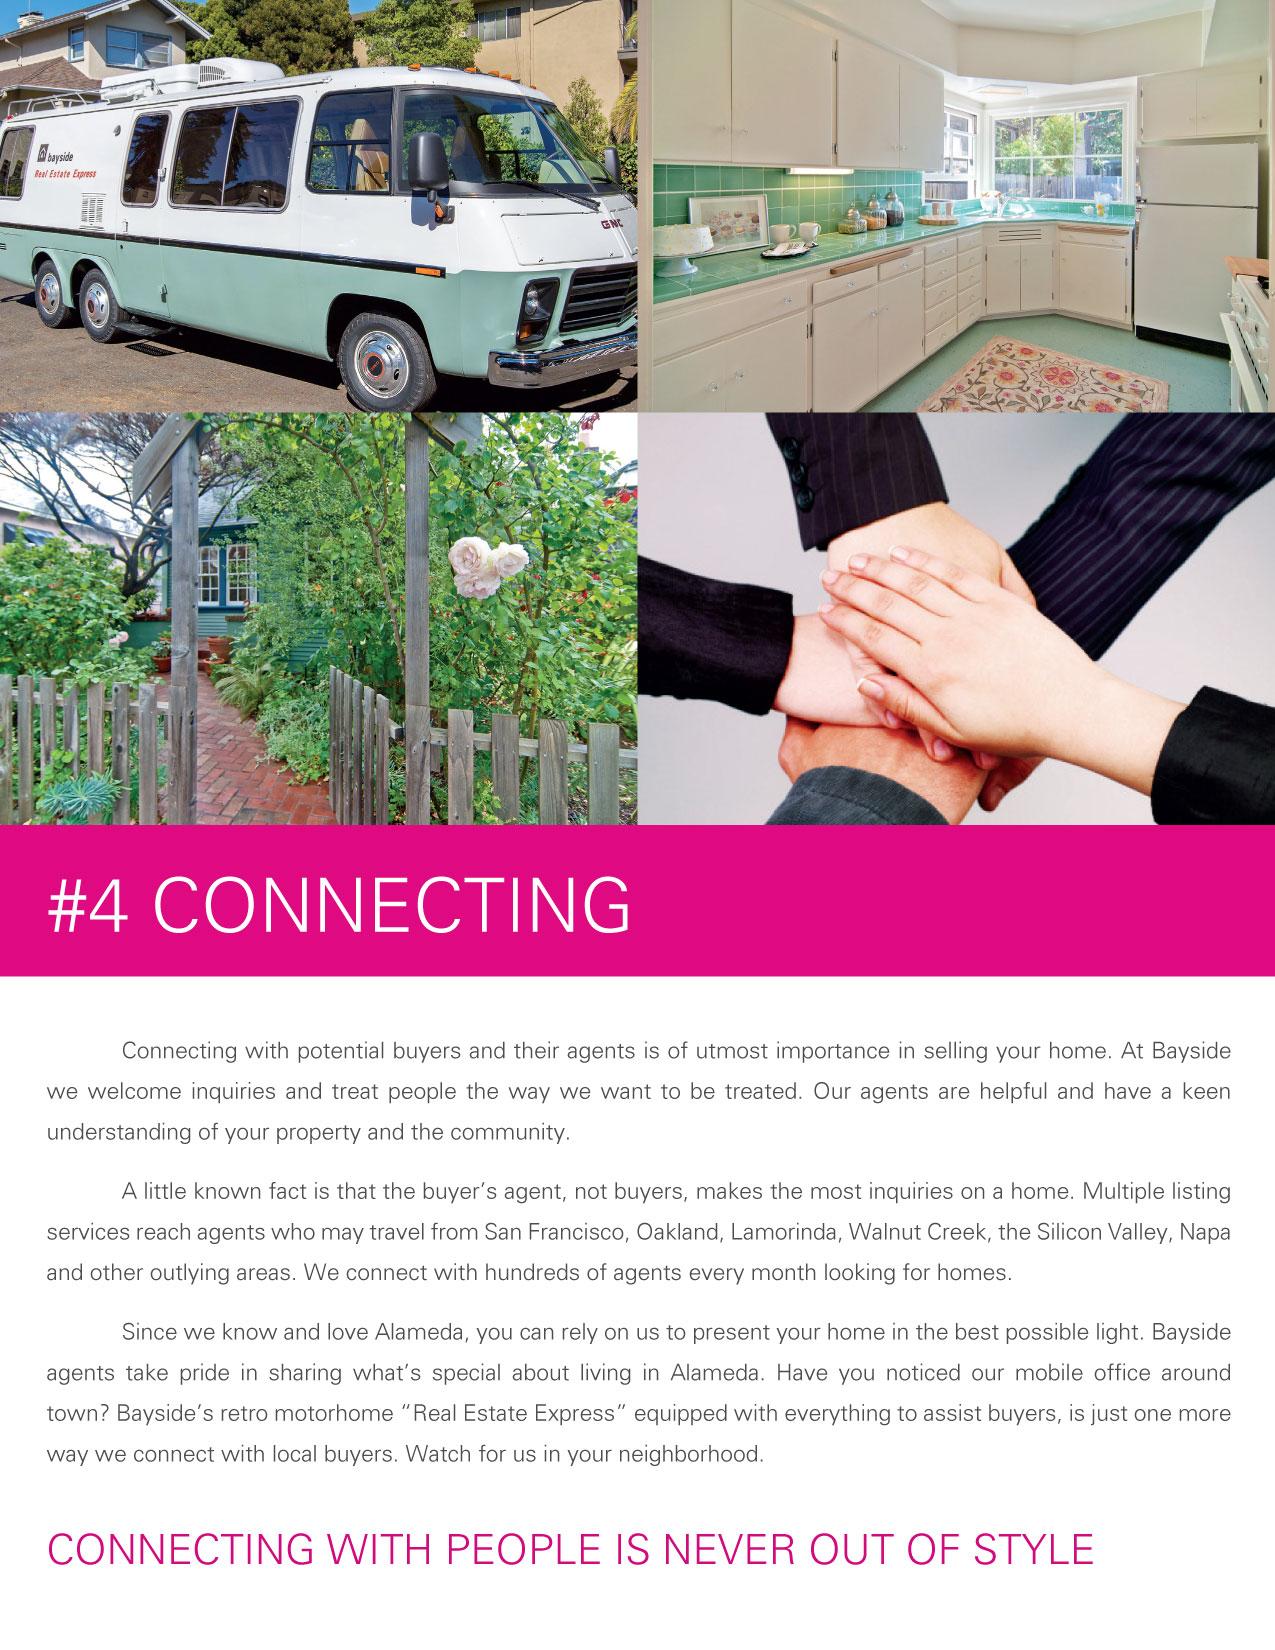 Listing Presentation - #4 Connecting